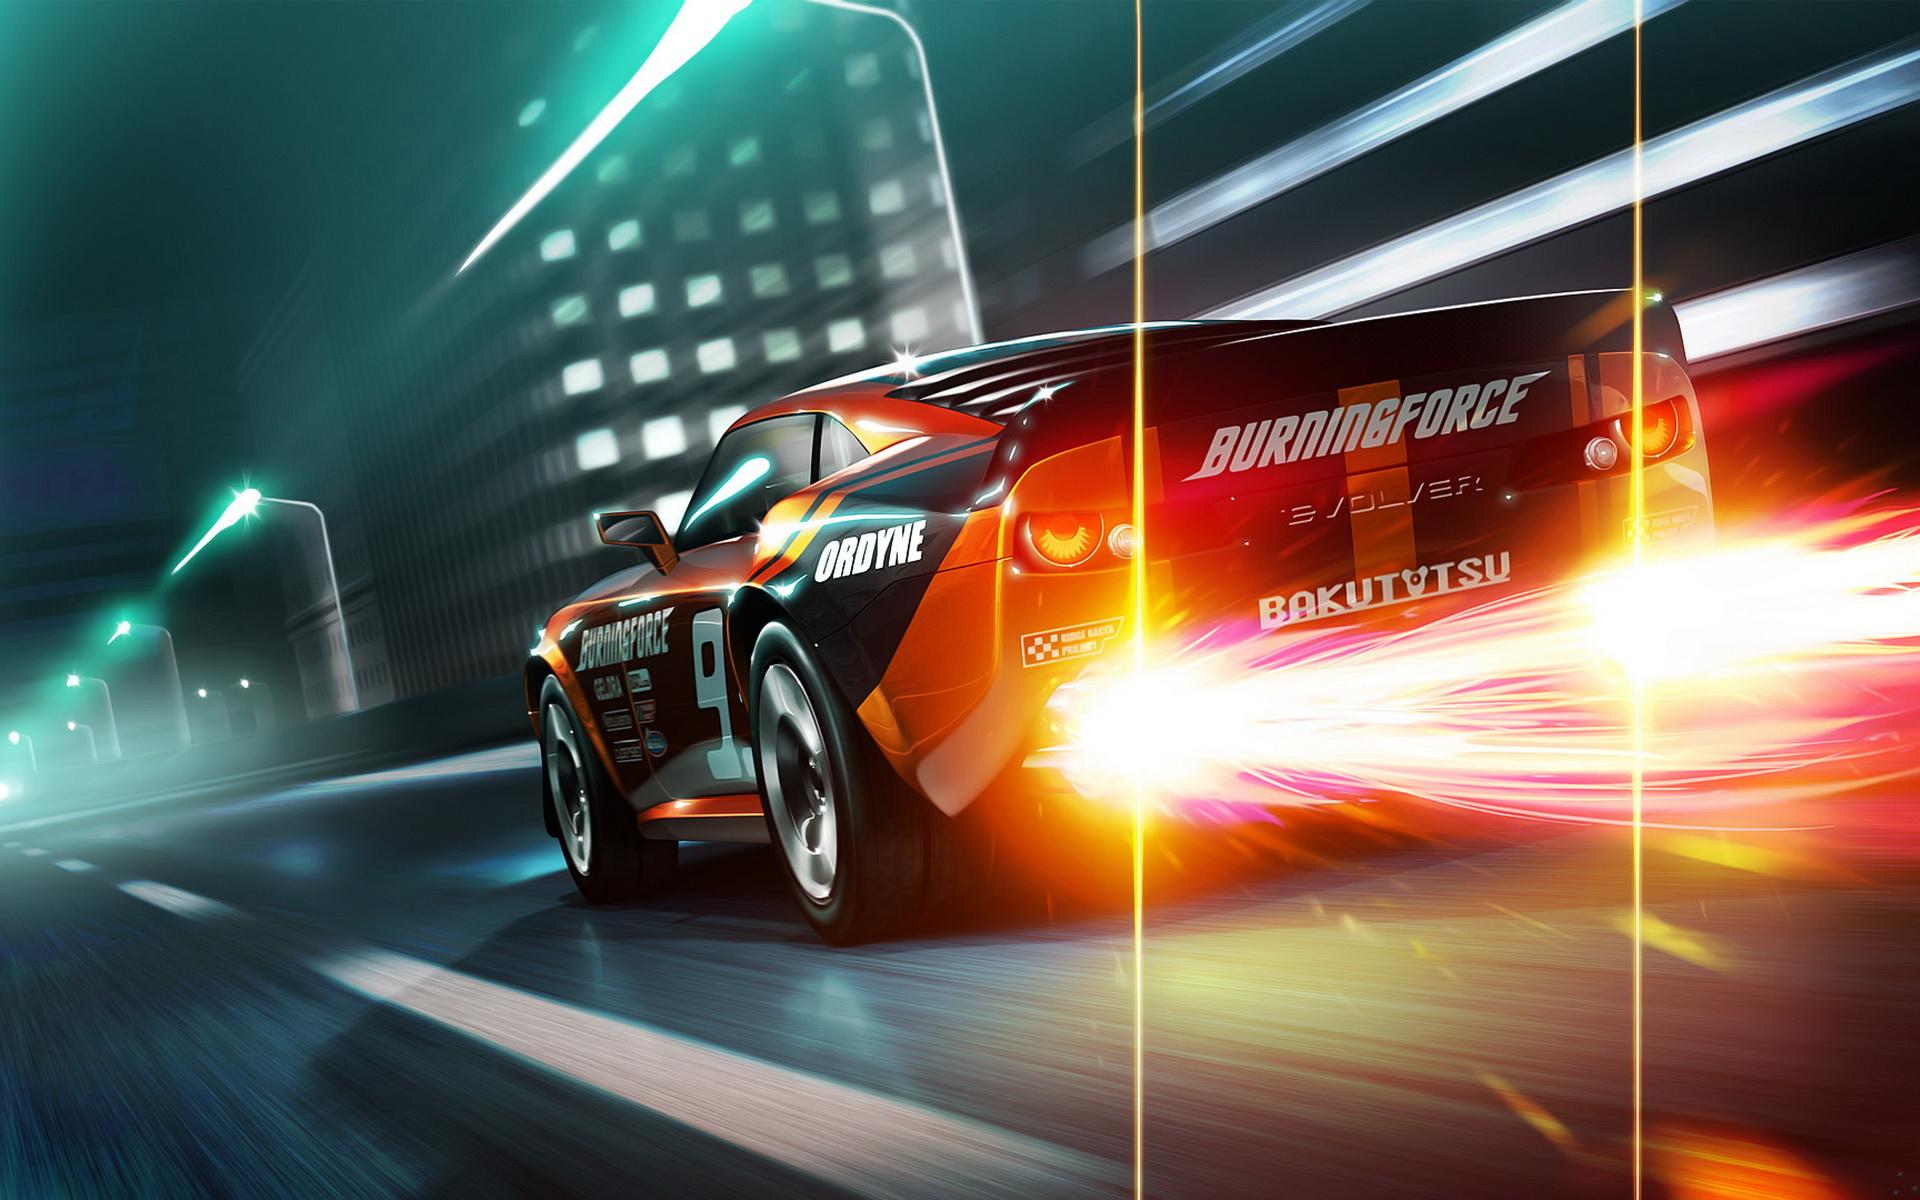 Free Ridge Racer 7 Wallpaper In 1280x800: Ridge Racer 7 Wallpapers And Images